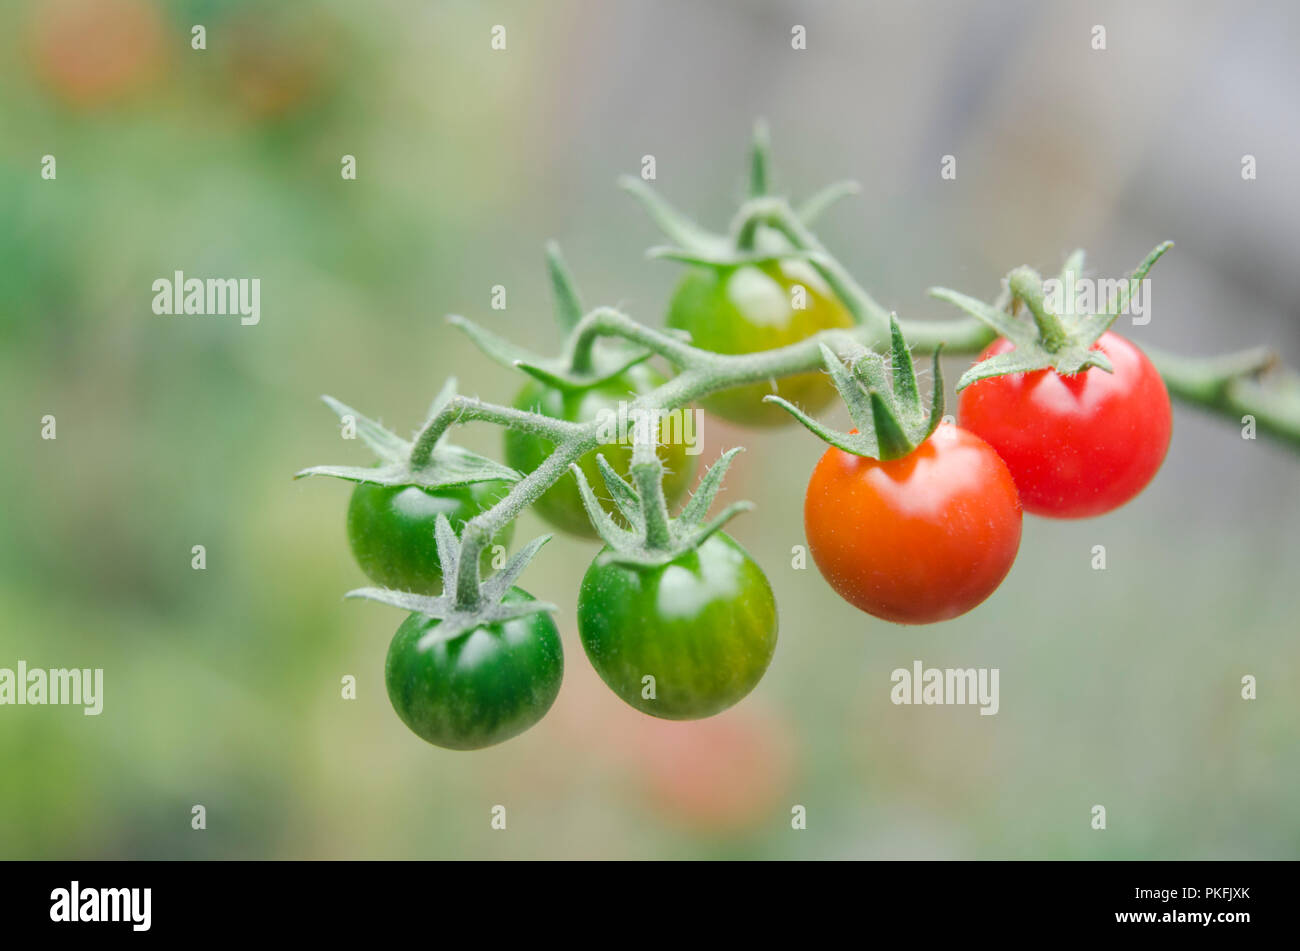 Berühmt Cherry-Tomaten Reifen am Rebstock Stockfoto, Bild: 218547019 - Alamy &JT_18